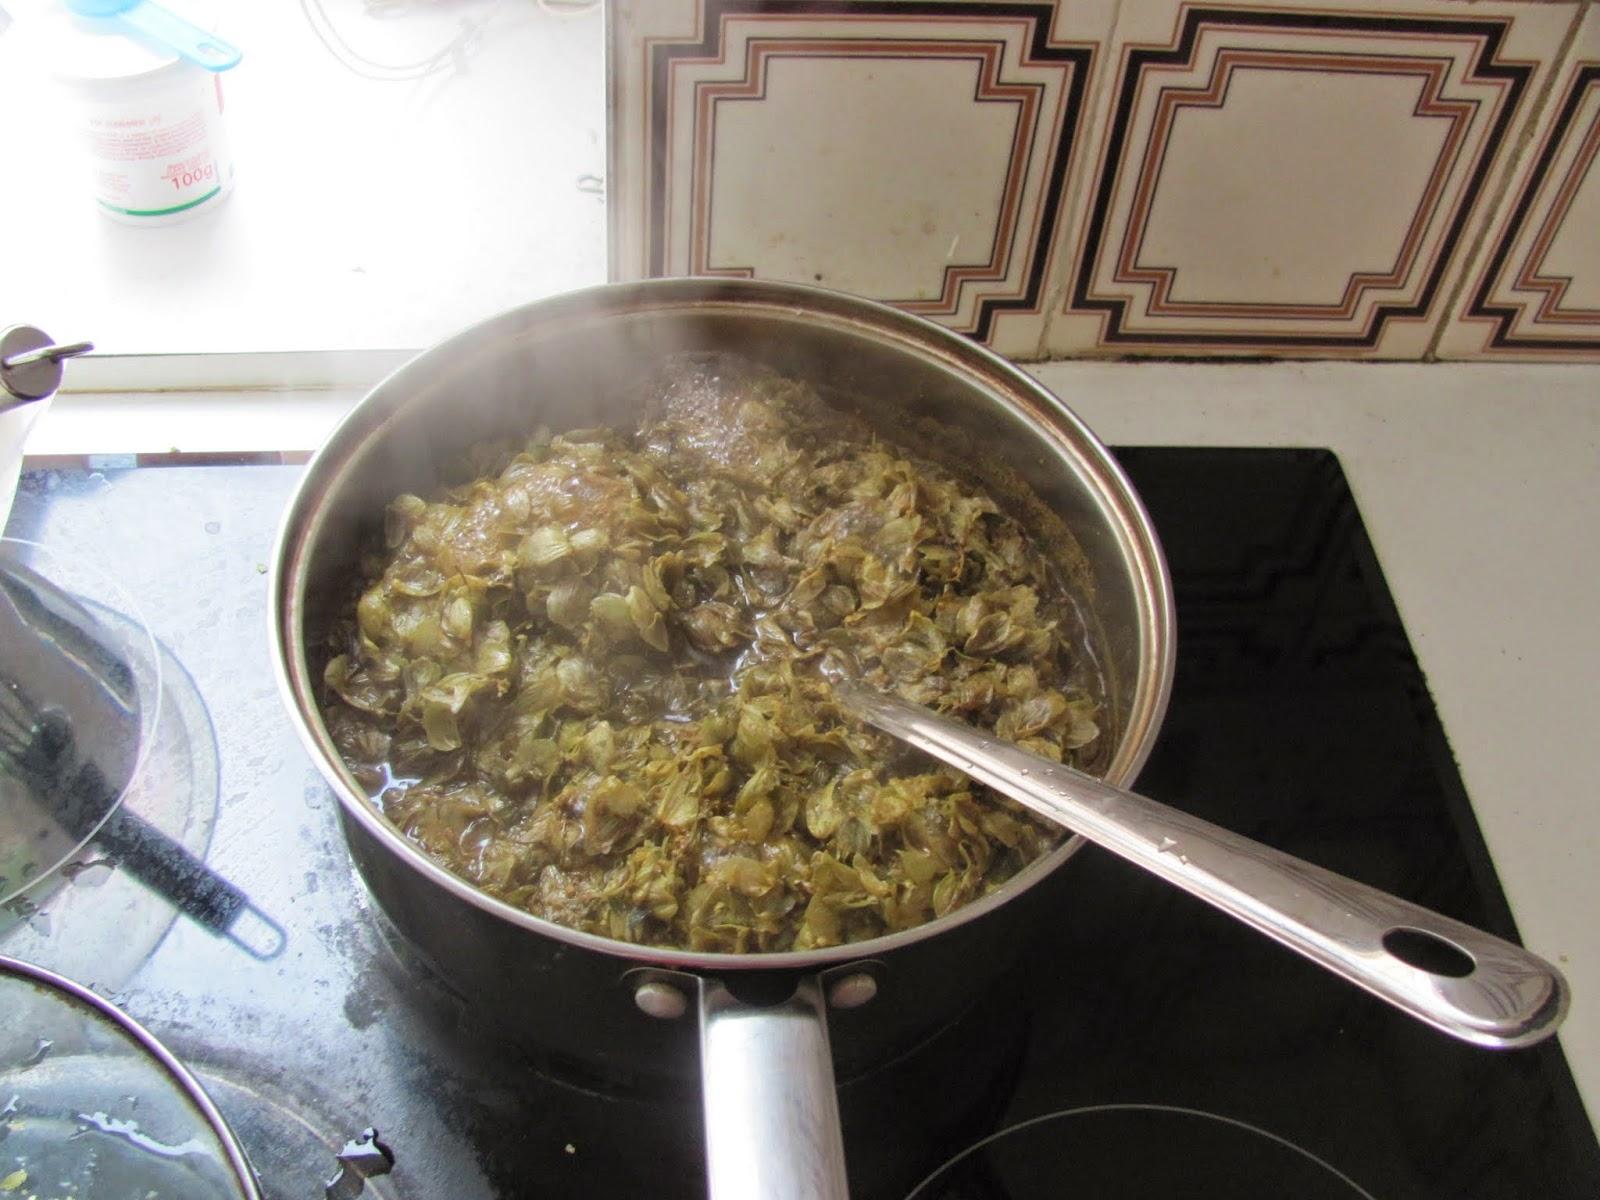 Boiling Hops